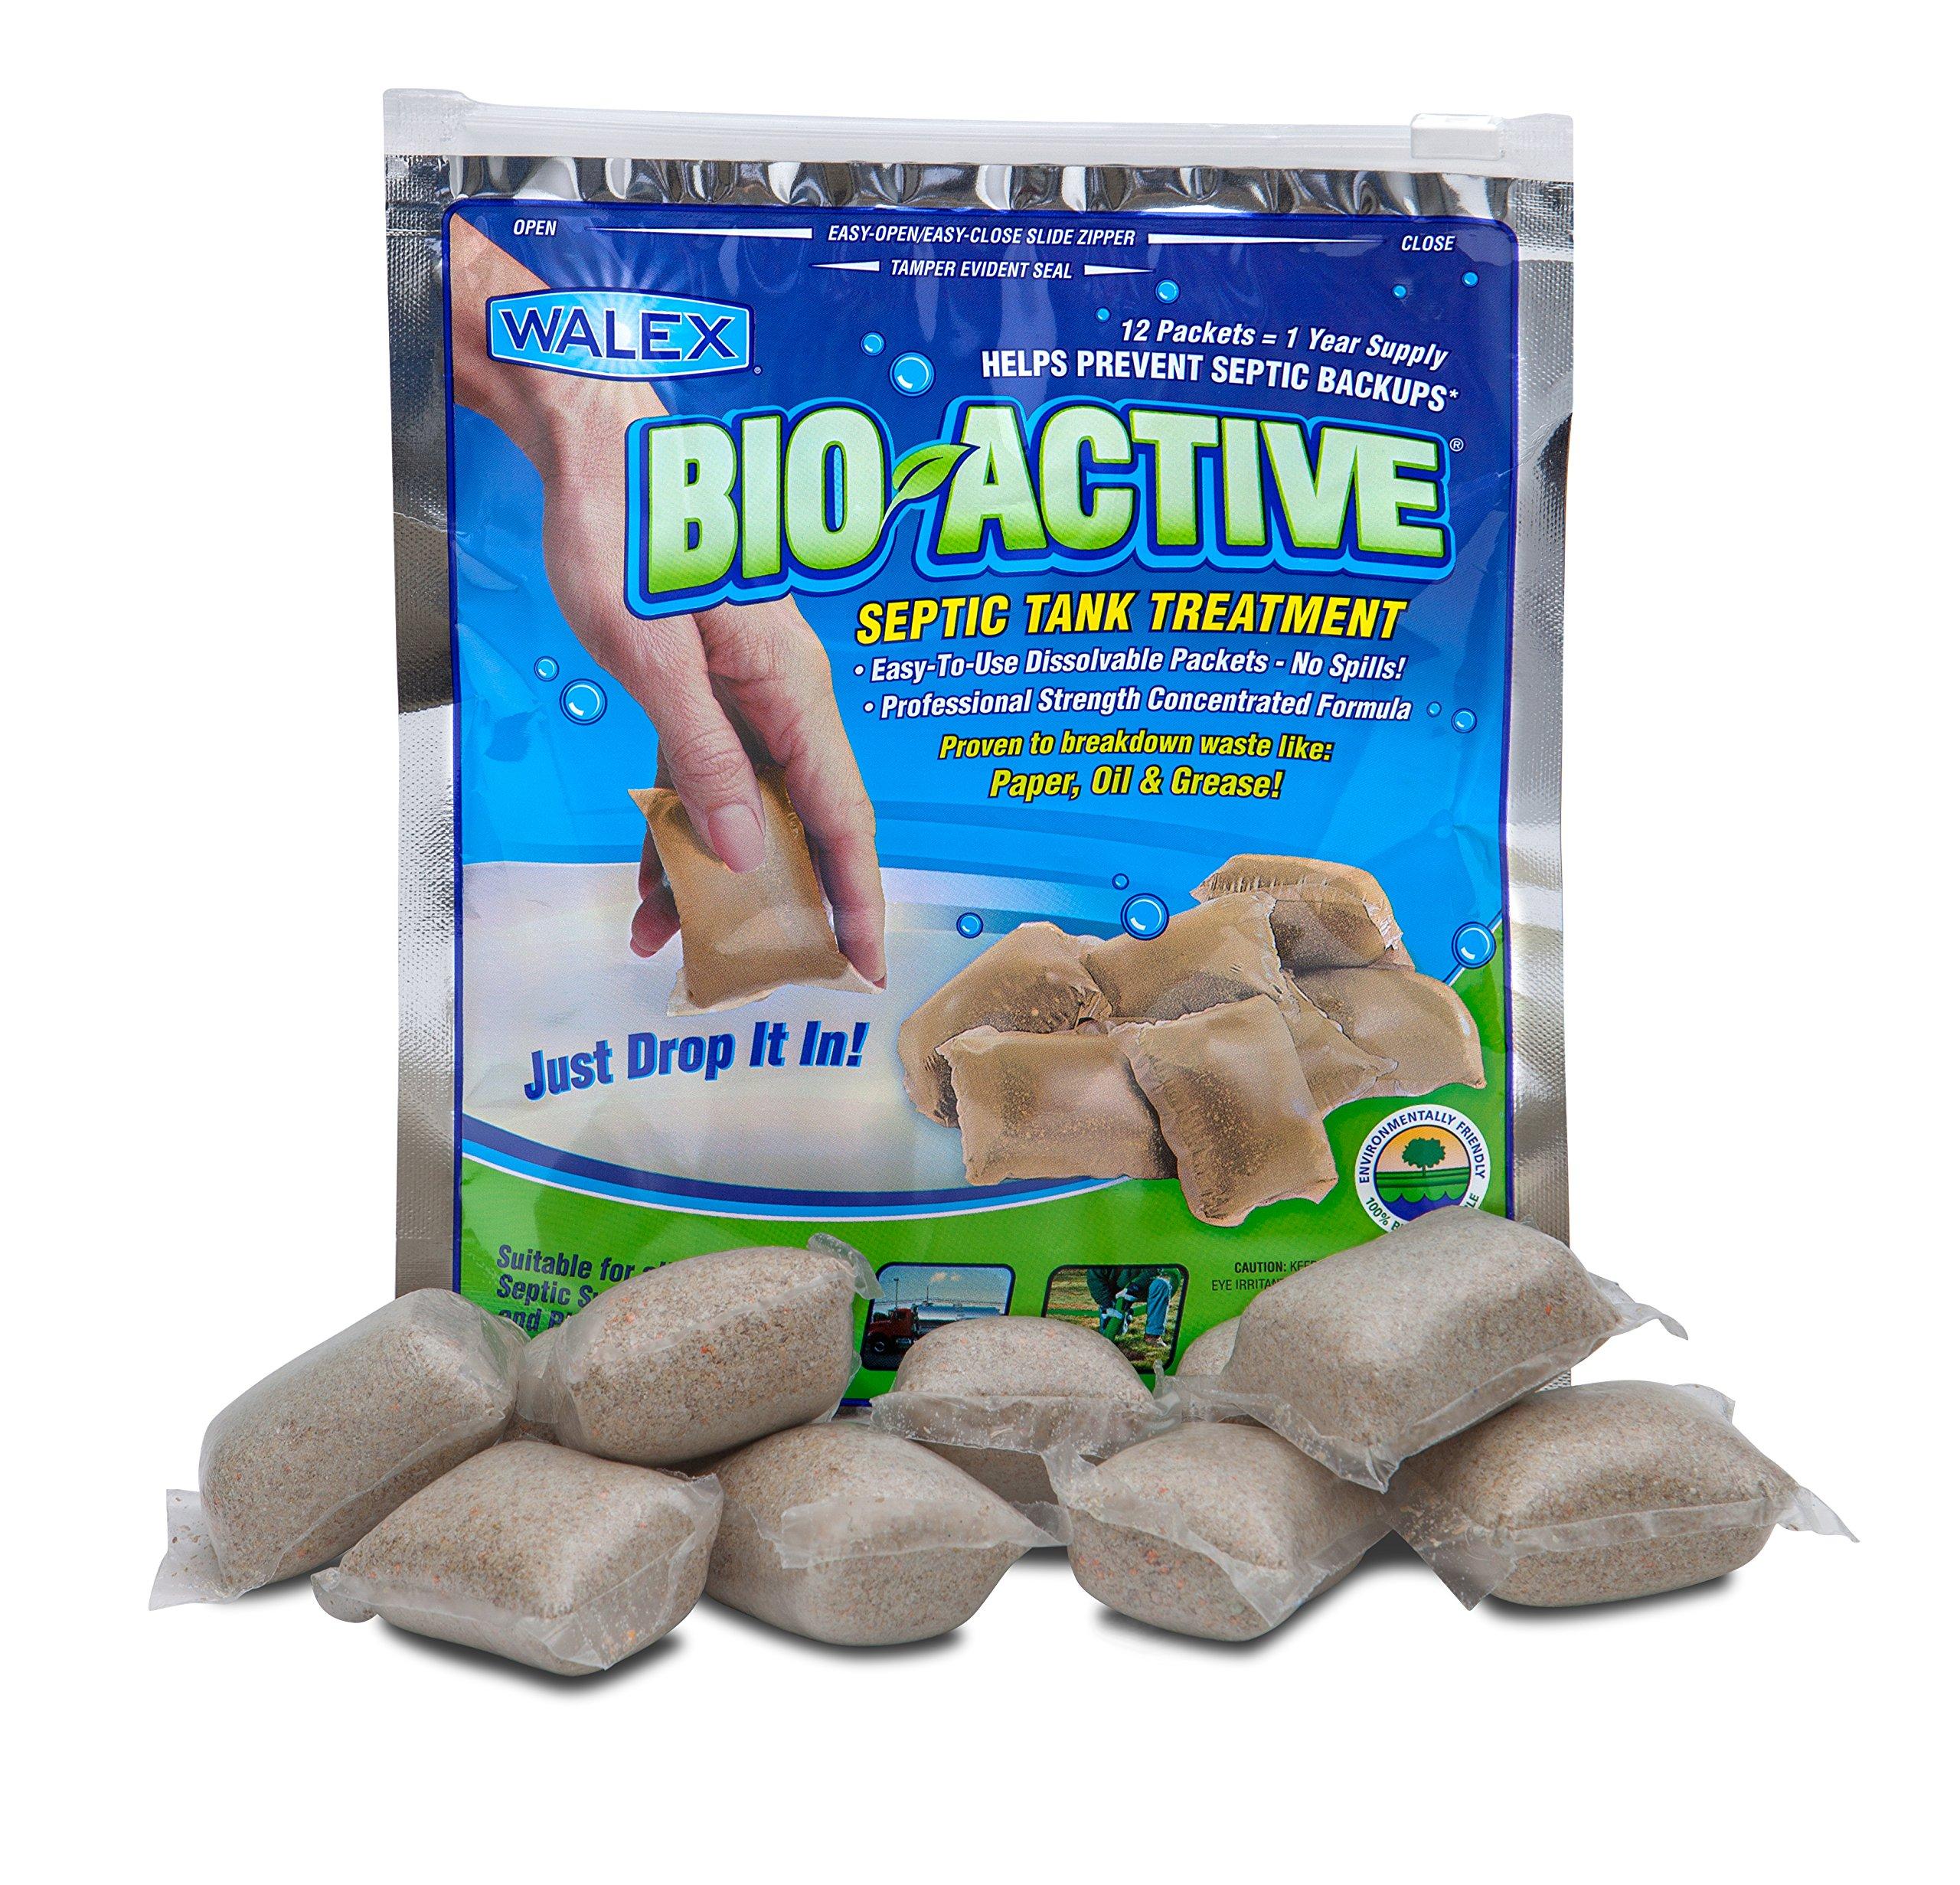 Walex BIO-31112 Bio-Active Septic Tank Treatment Drop-Ins (1 Year Supply) by Bio-Active